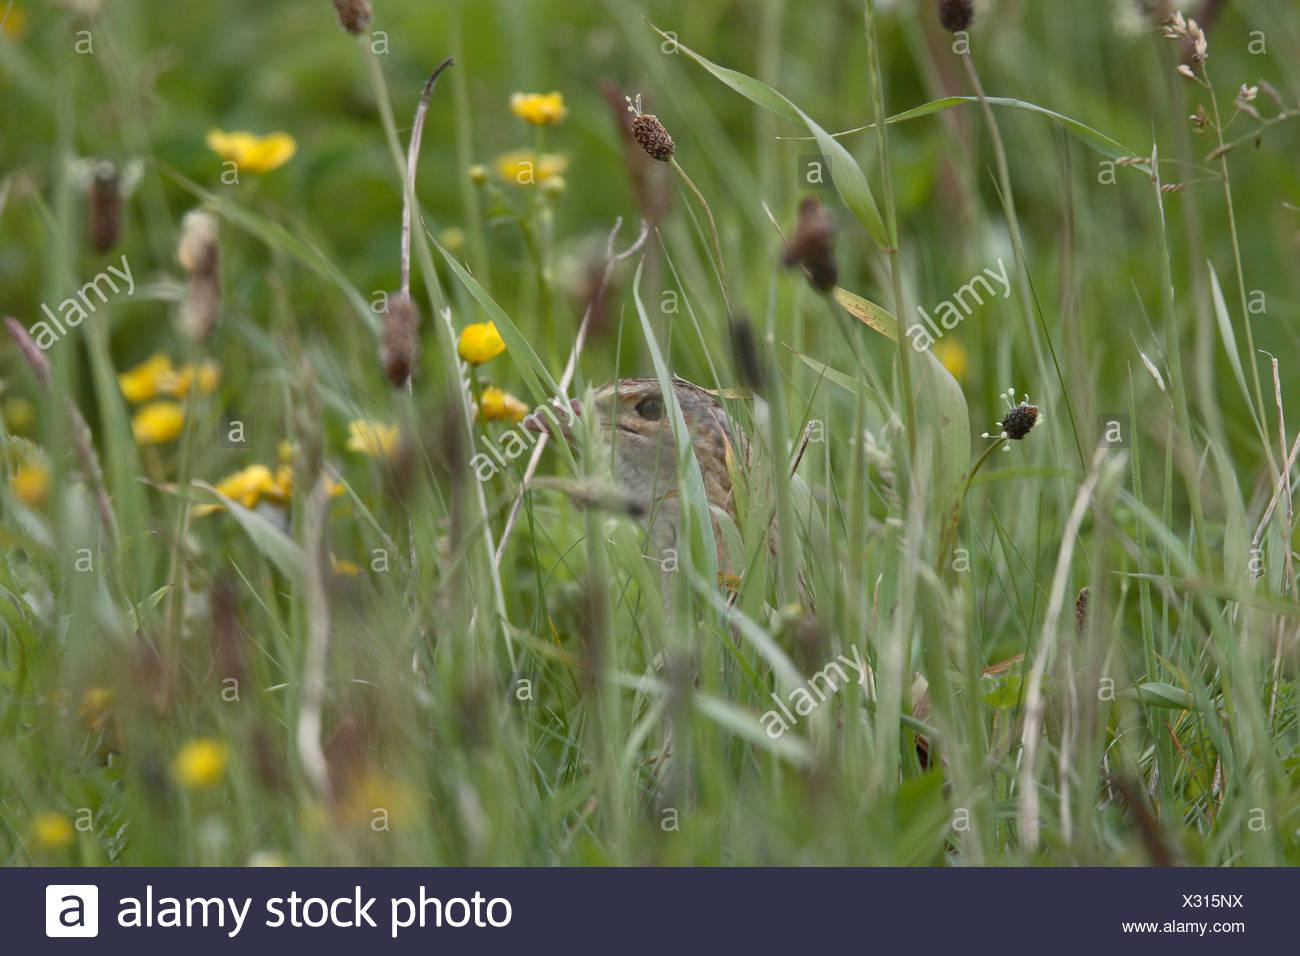 Corncrake- a most elusive species. Barra, Outer Hebrides, Scotland. - Stock Image